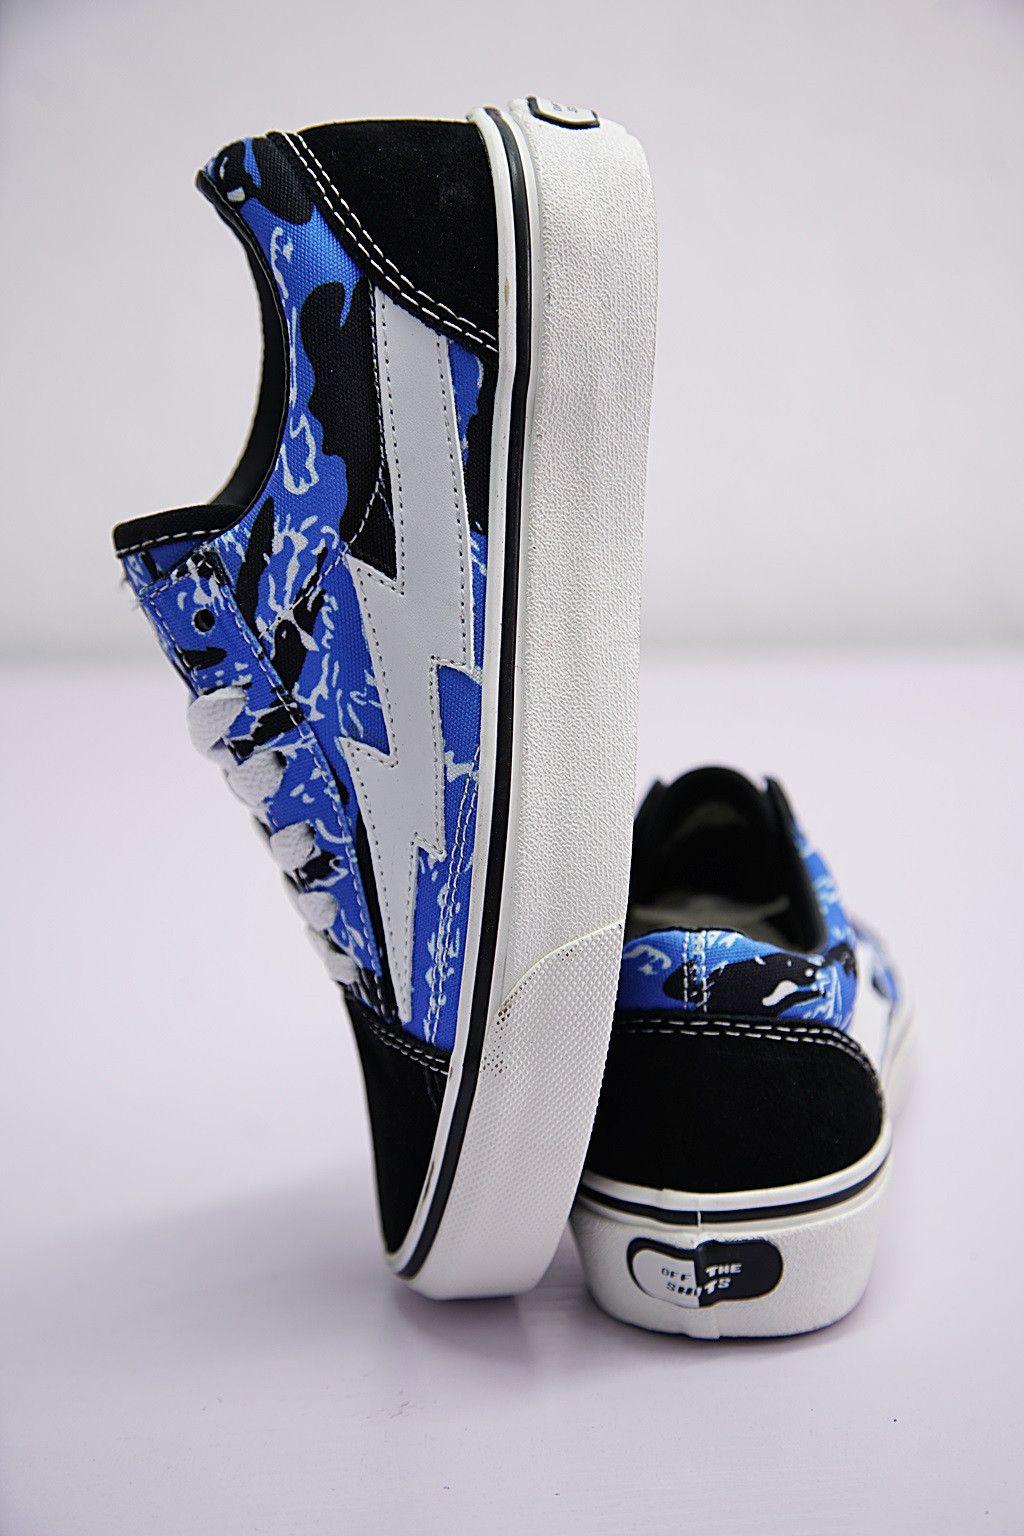 b017ae81c6 VANS REVENGE X STORM WATER BLUE WHITE 008243210 Chaussettes